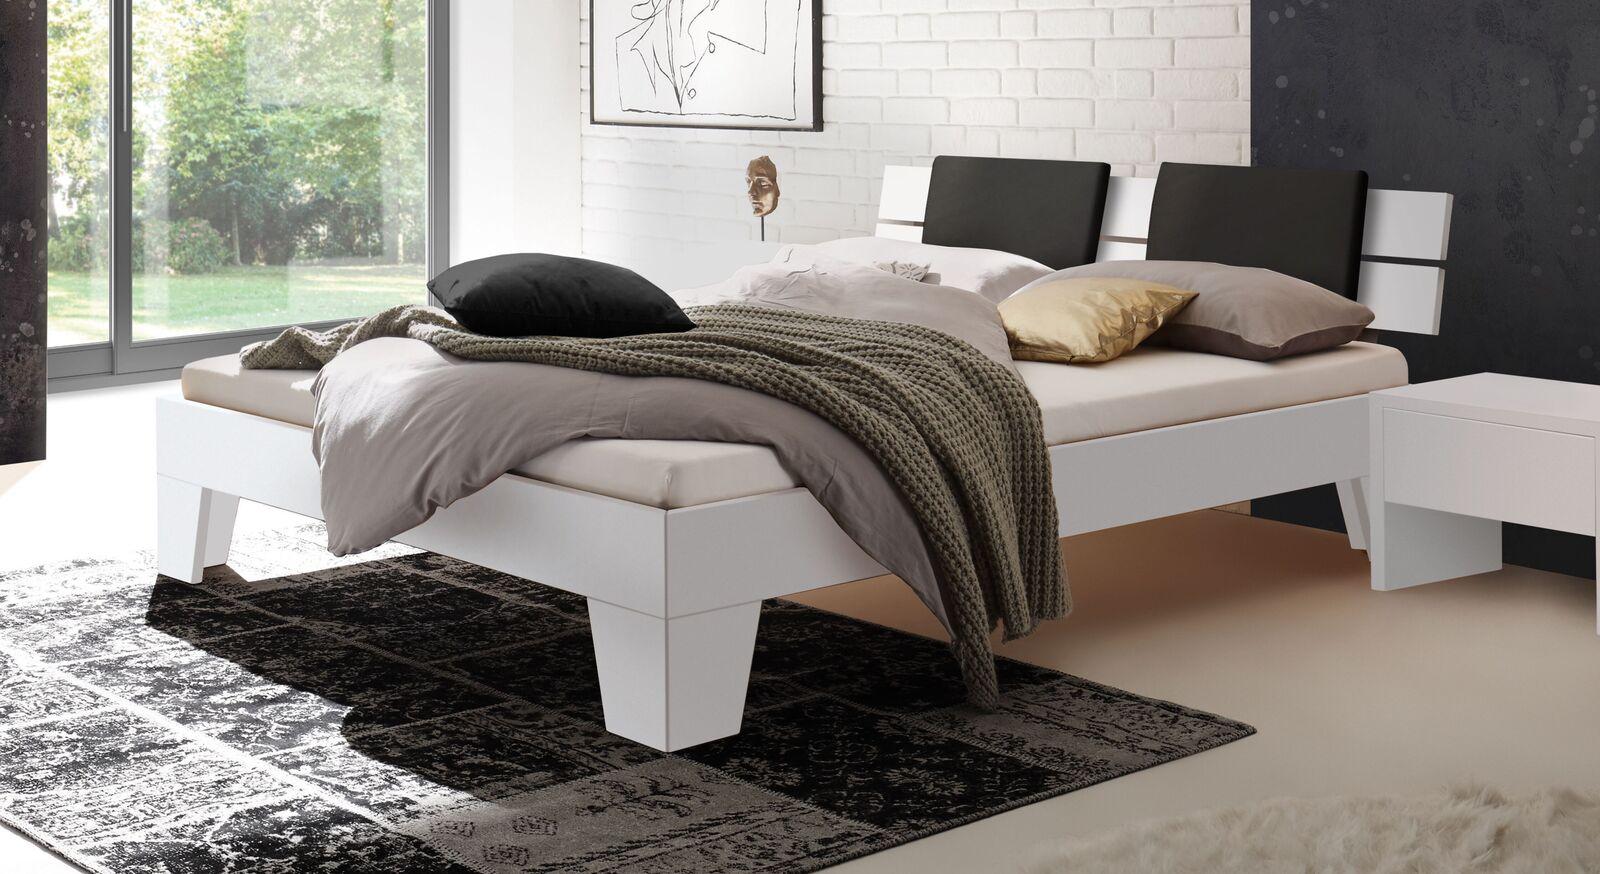 Modernes Bett Kieran in Weiß